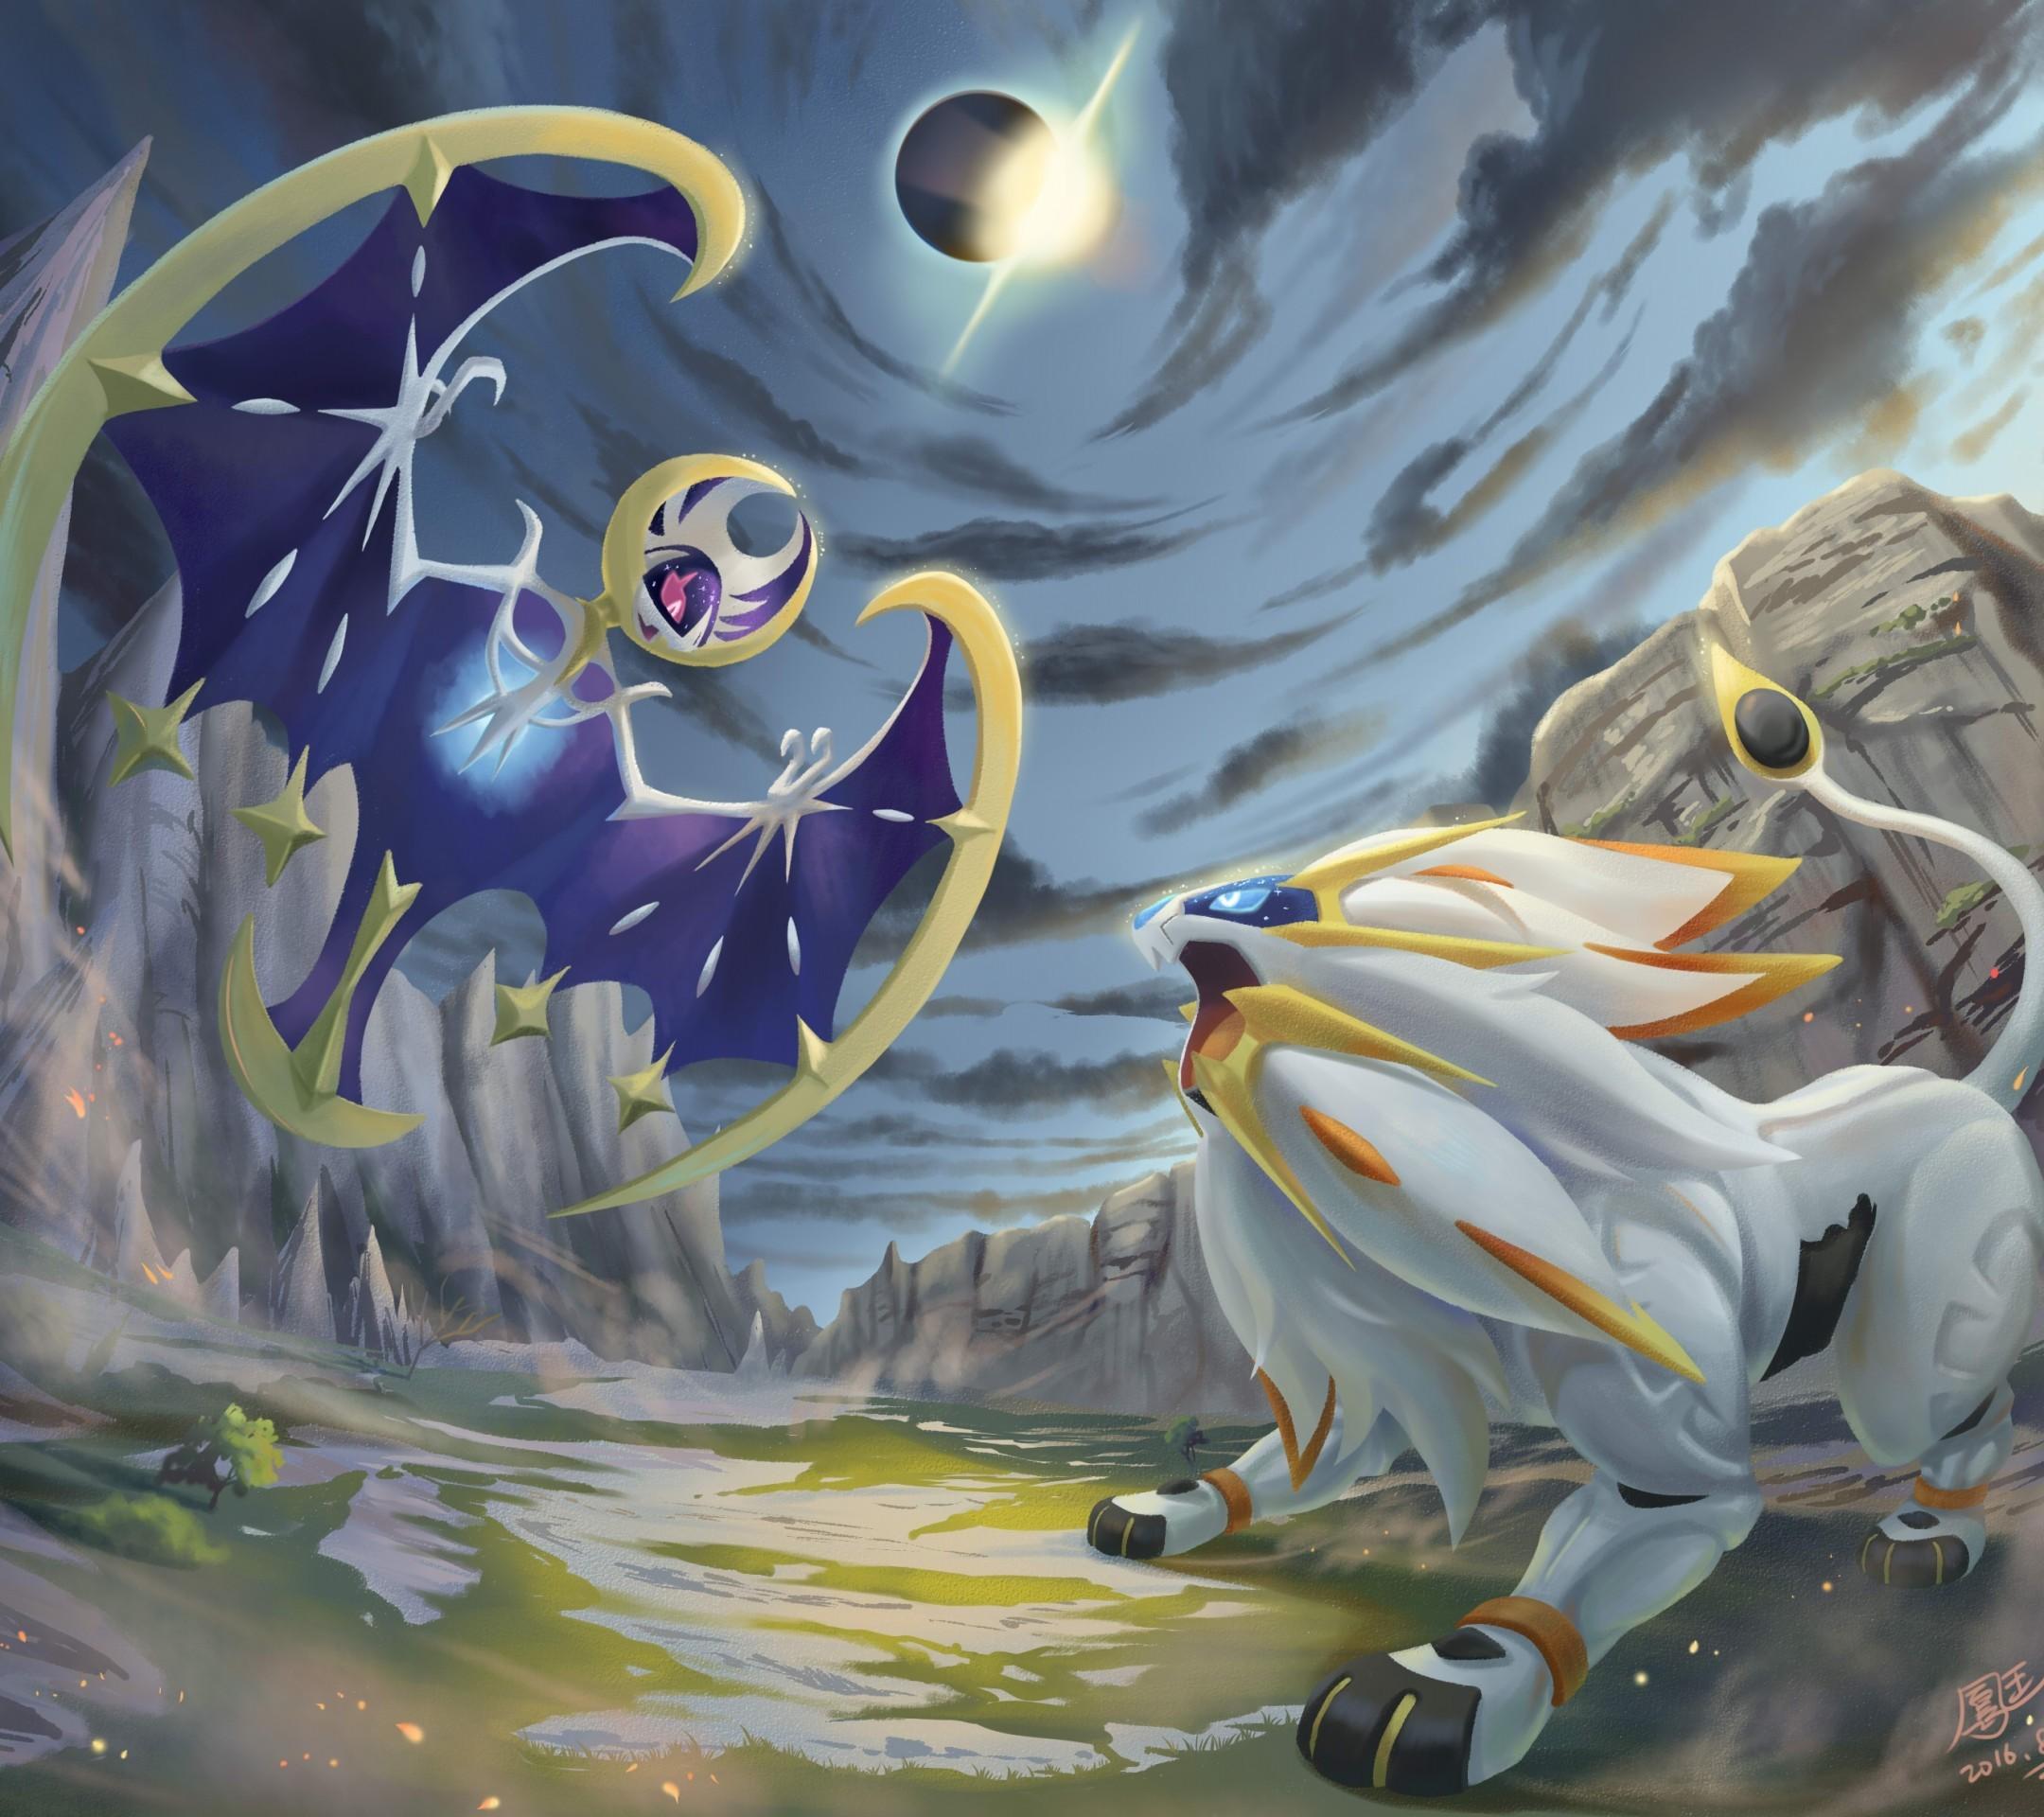 Download 2160x1920 Lunala Pokemon Solgaleo Artwork Clouds 2160x1920